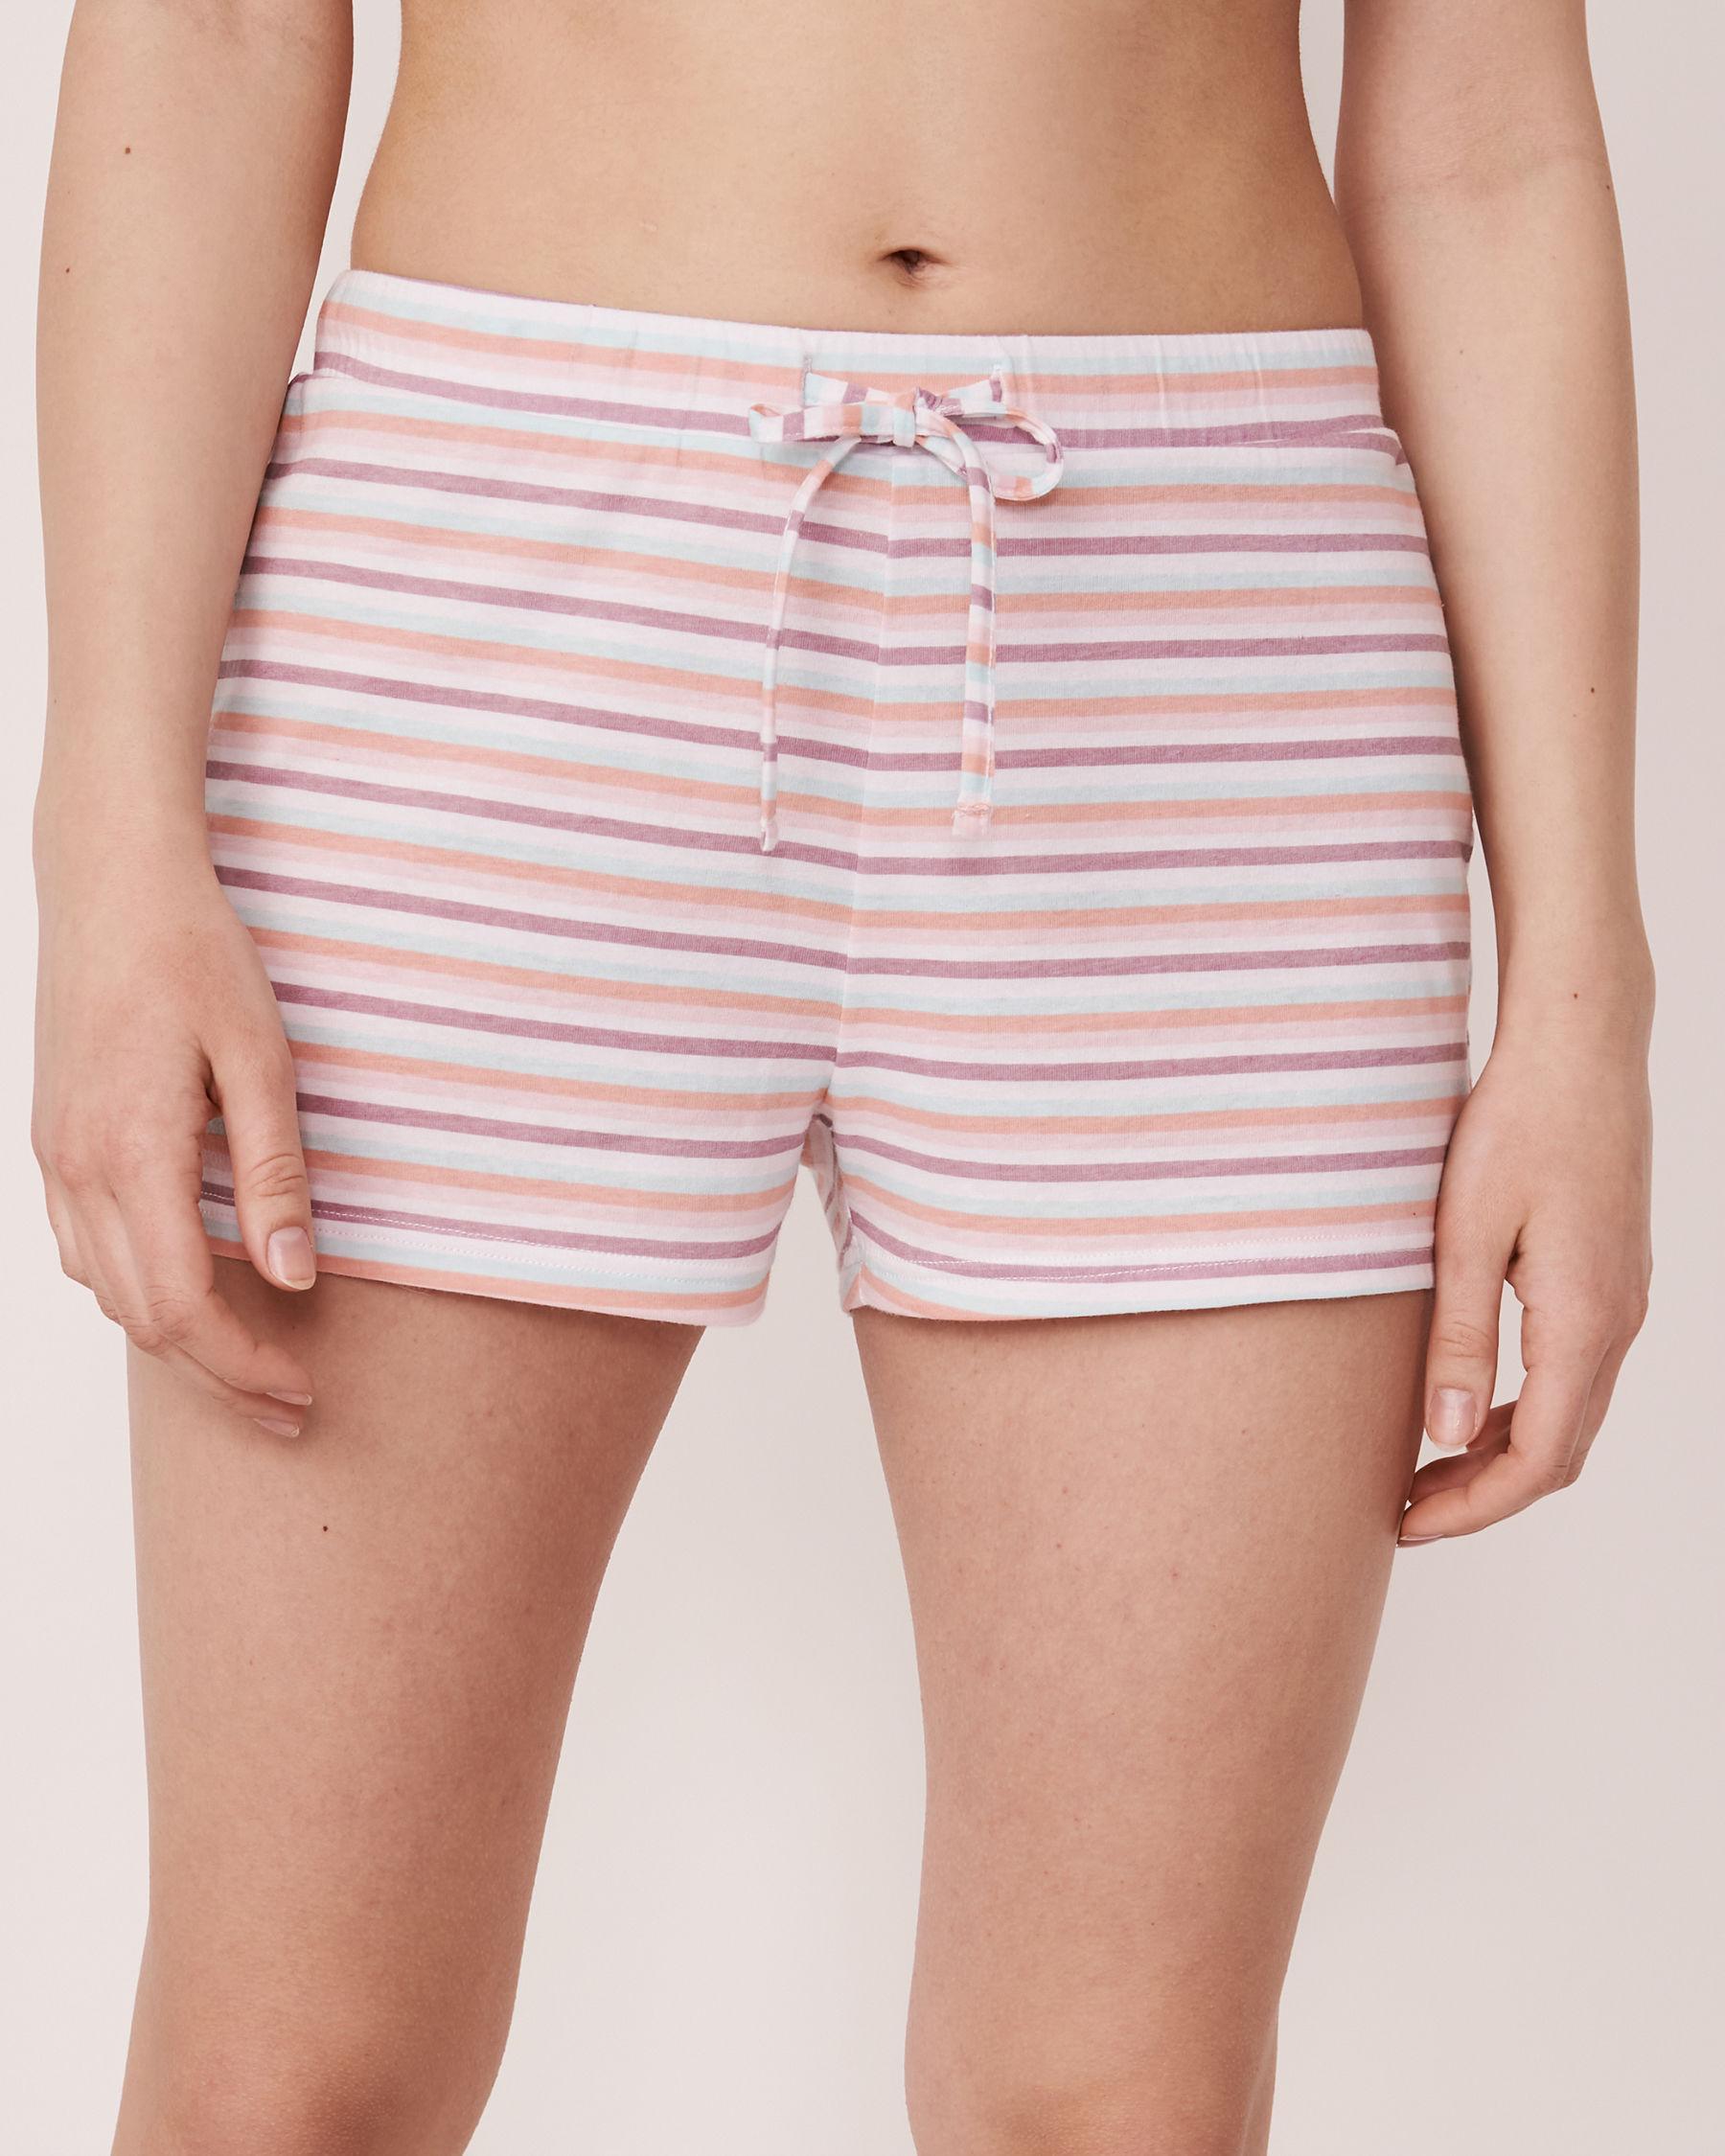 LA VIE EN ROSE Pyjama Short with Elastic Waistband Stripes 40200047 - View1